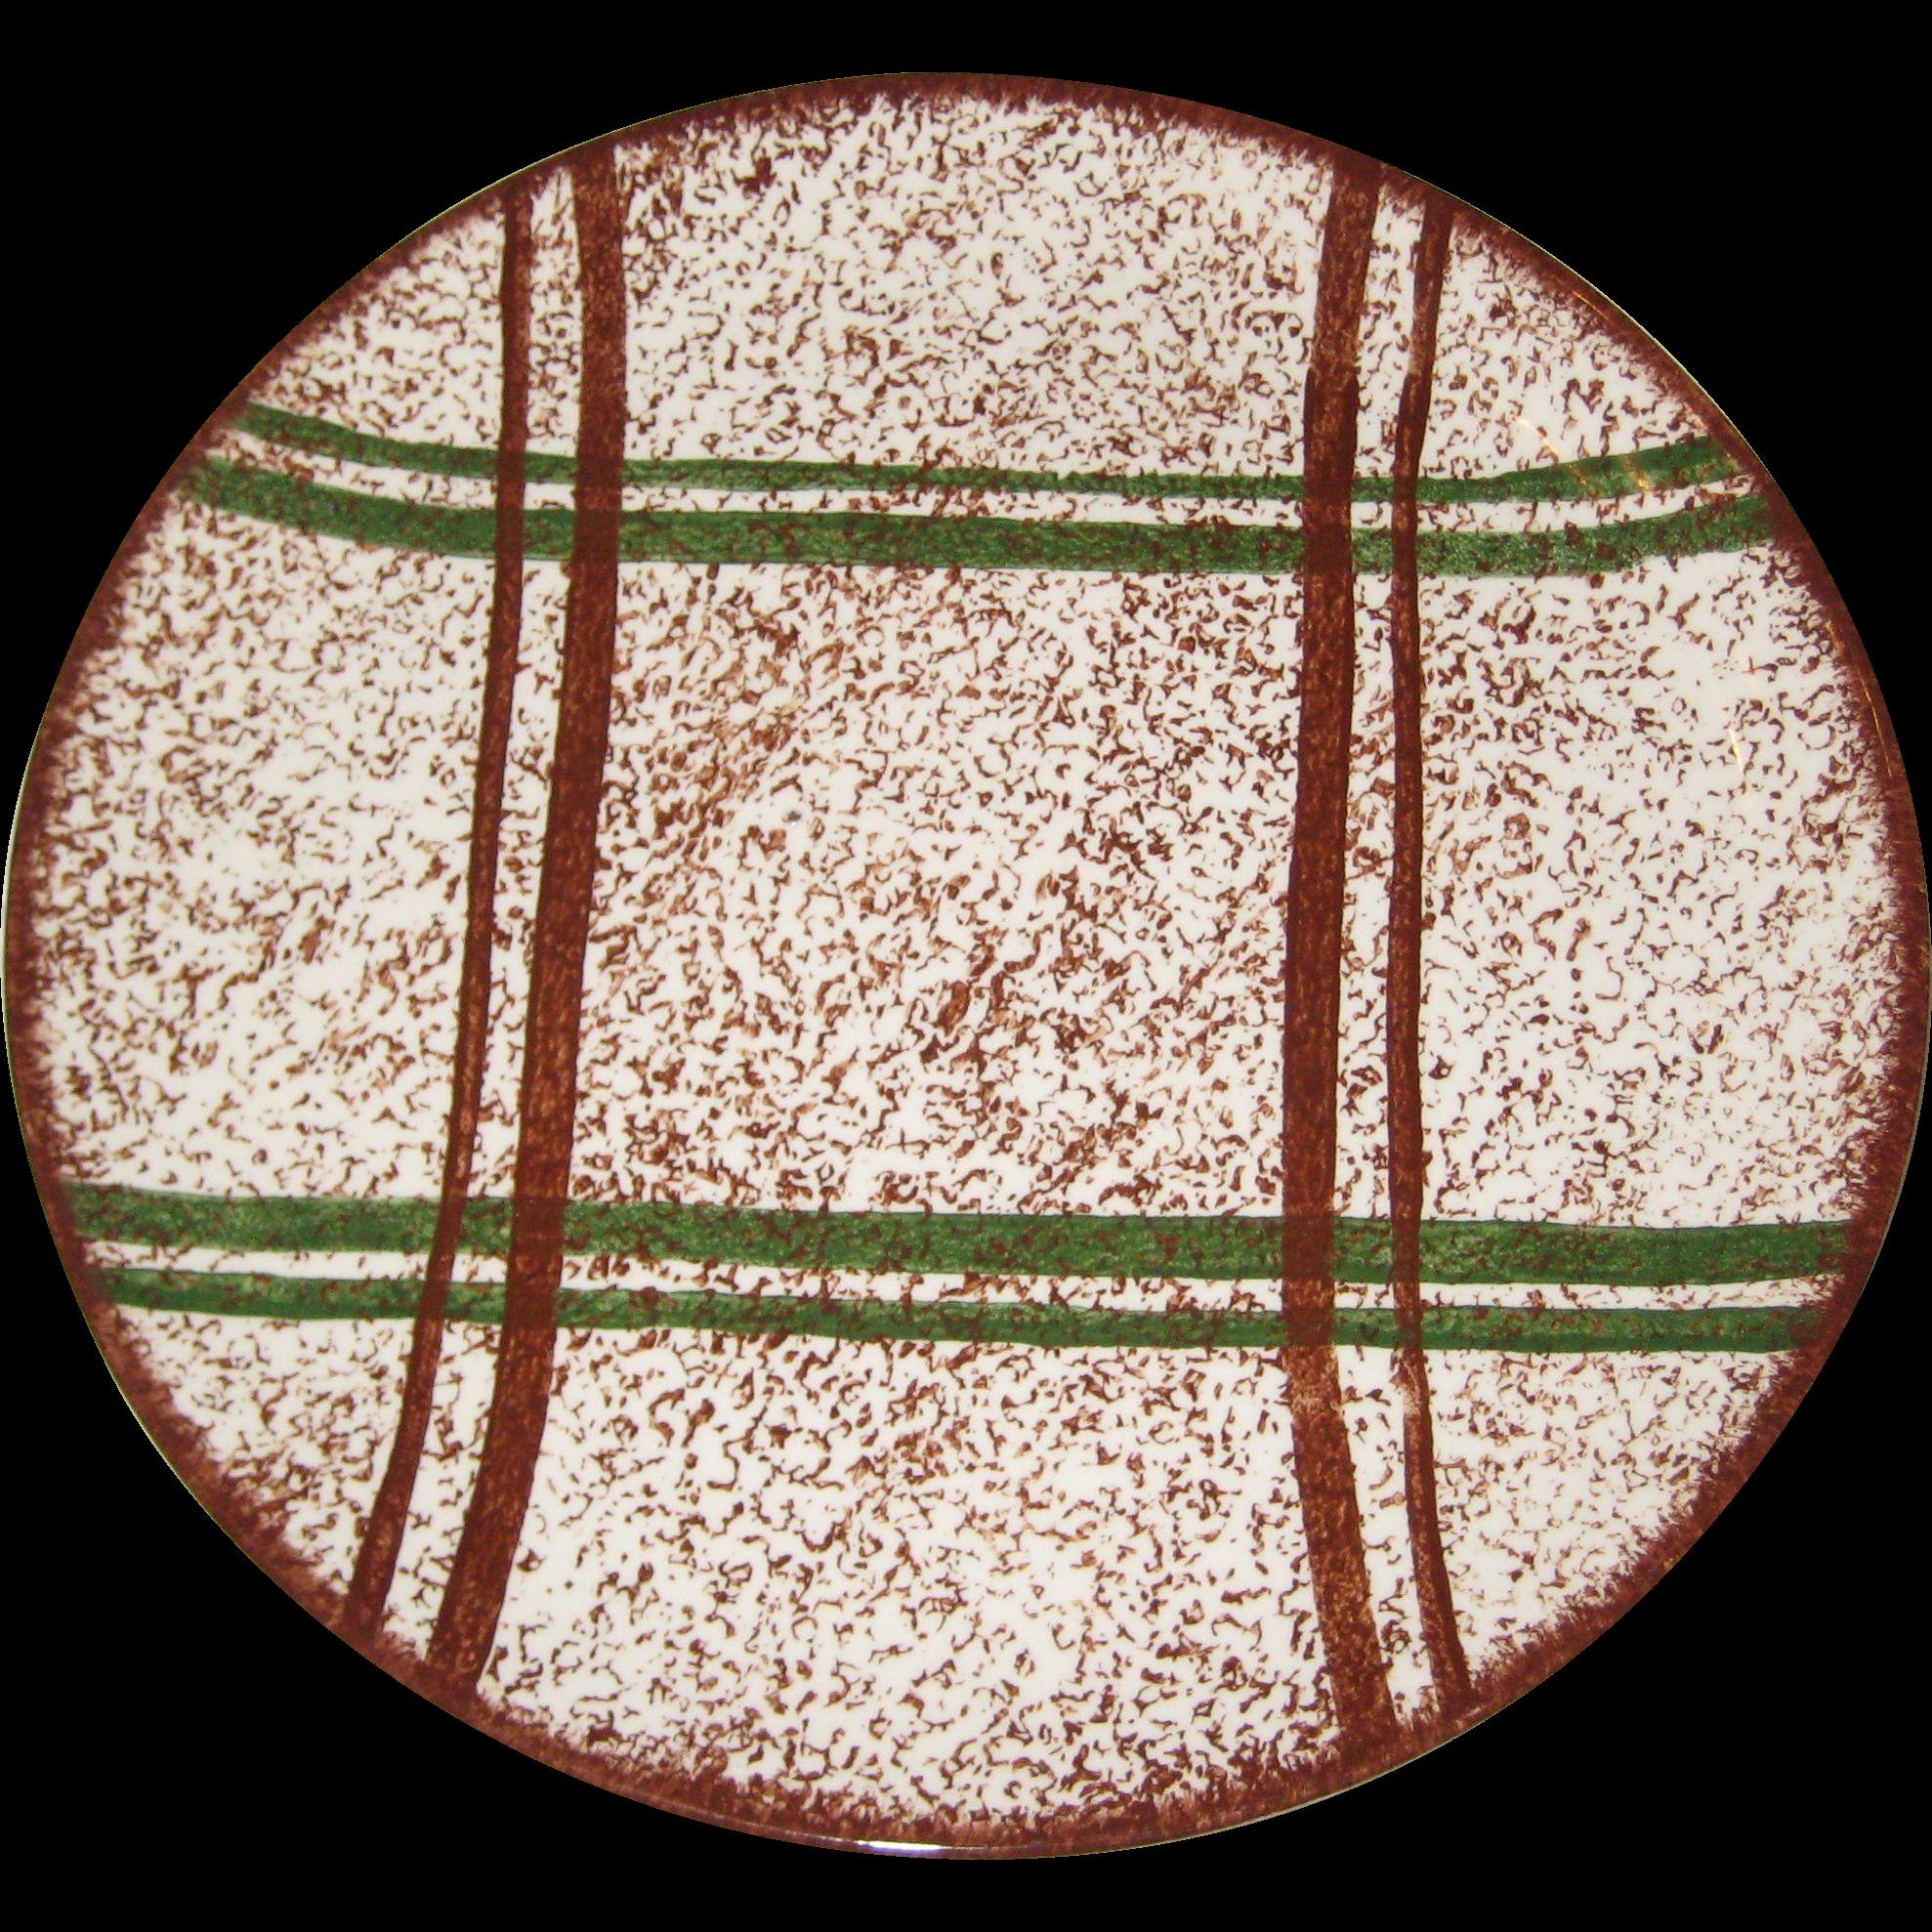 Blue Ridge Pottery Rustic Plaid Dinner Plate